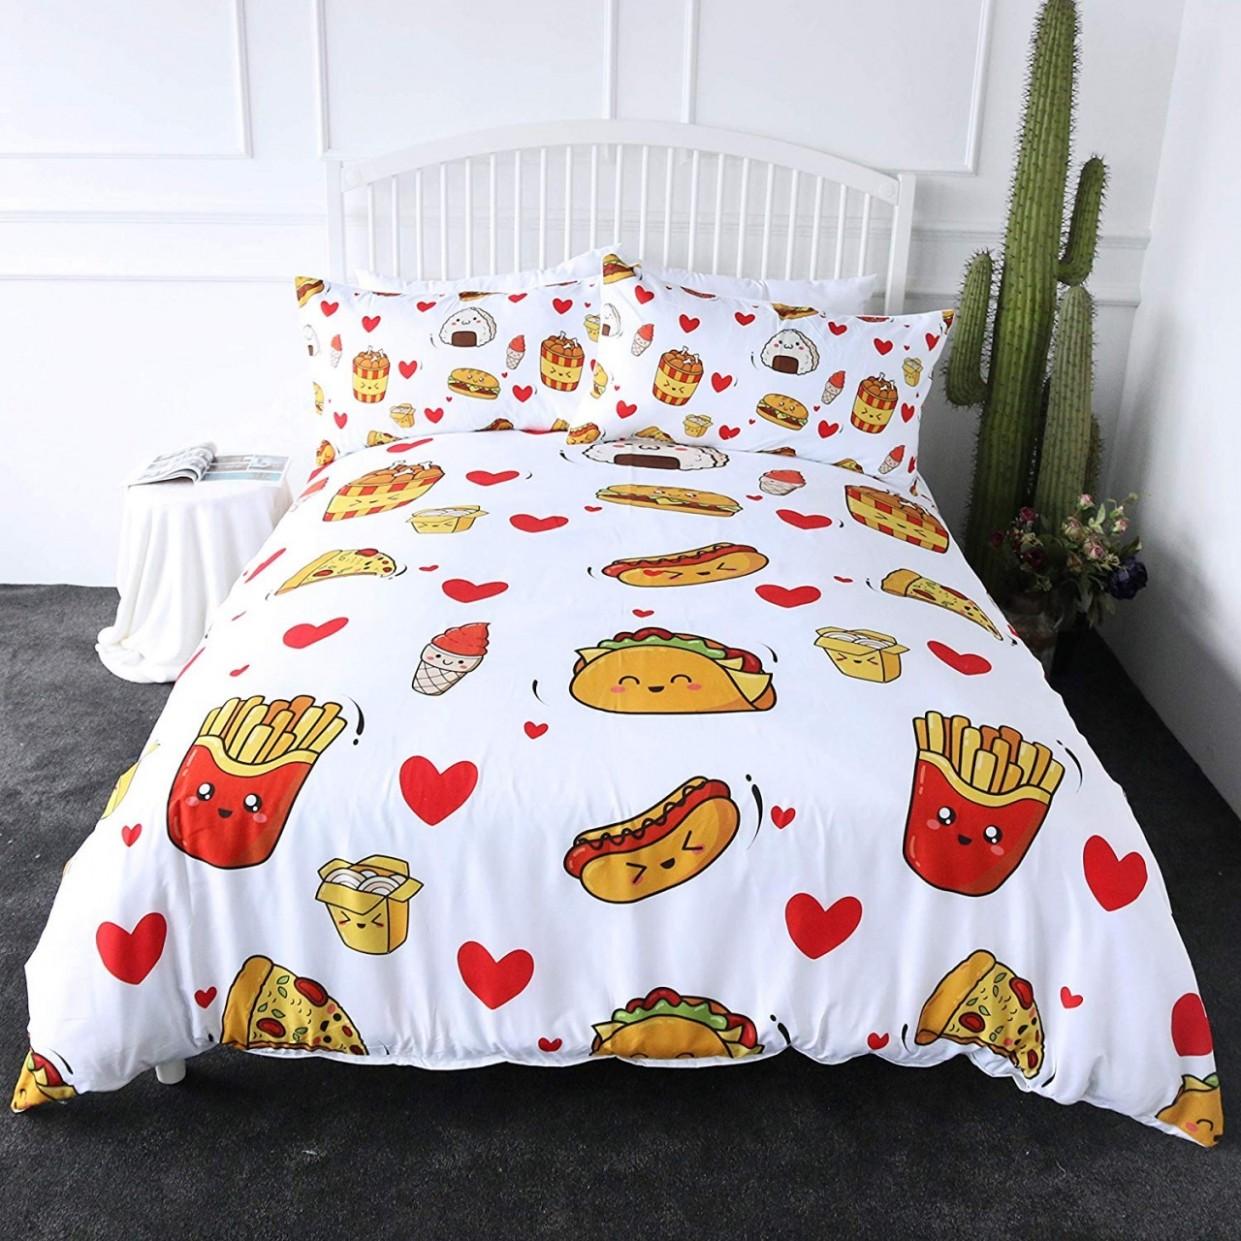 Floor and Decor Nj – Decor Art - Bedroom Ideas Amazon